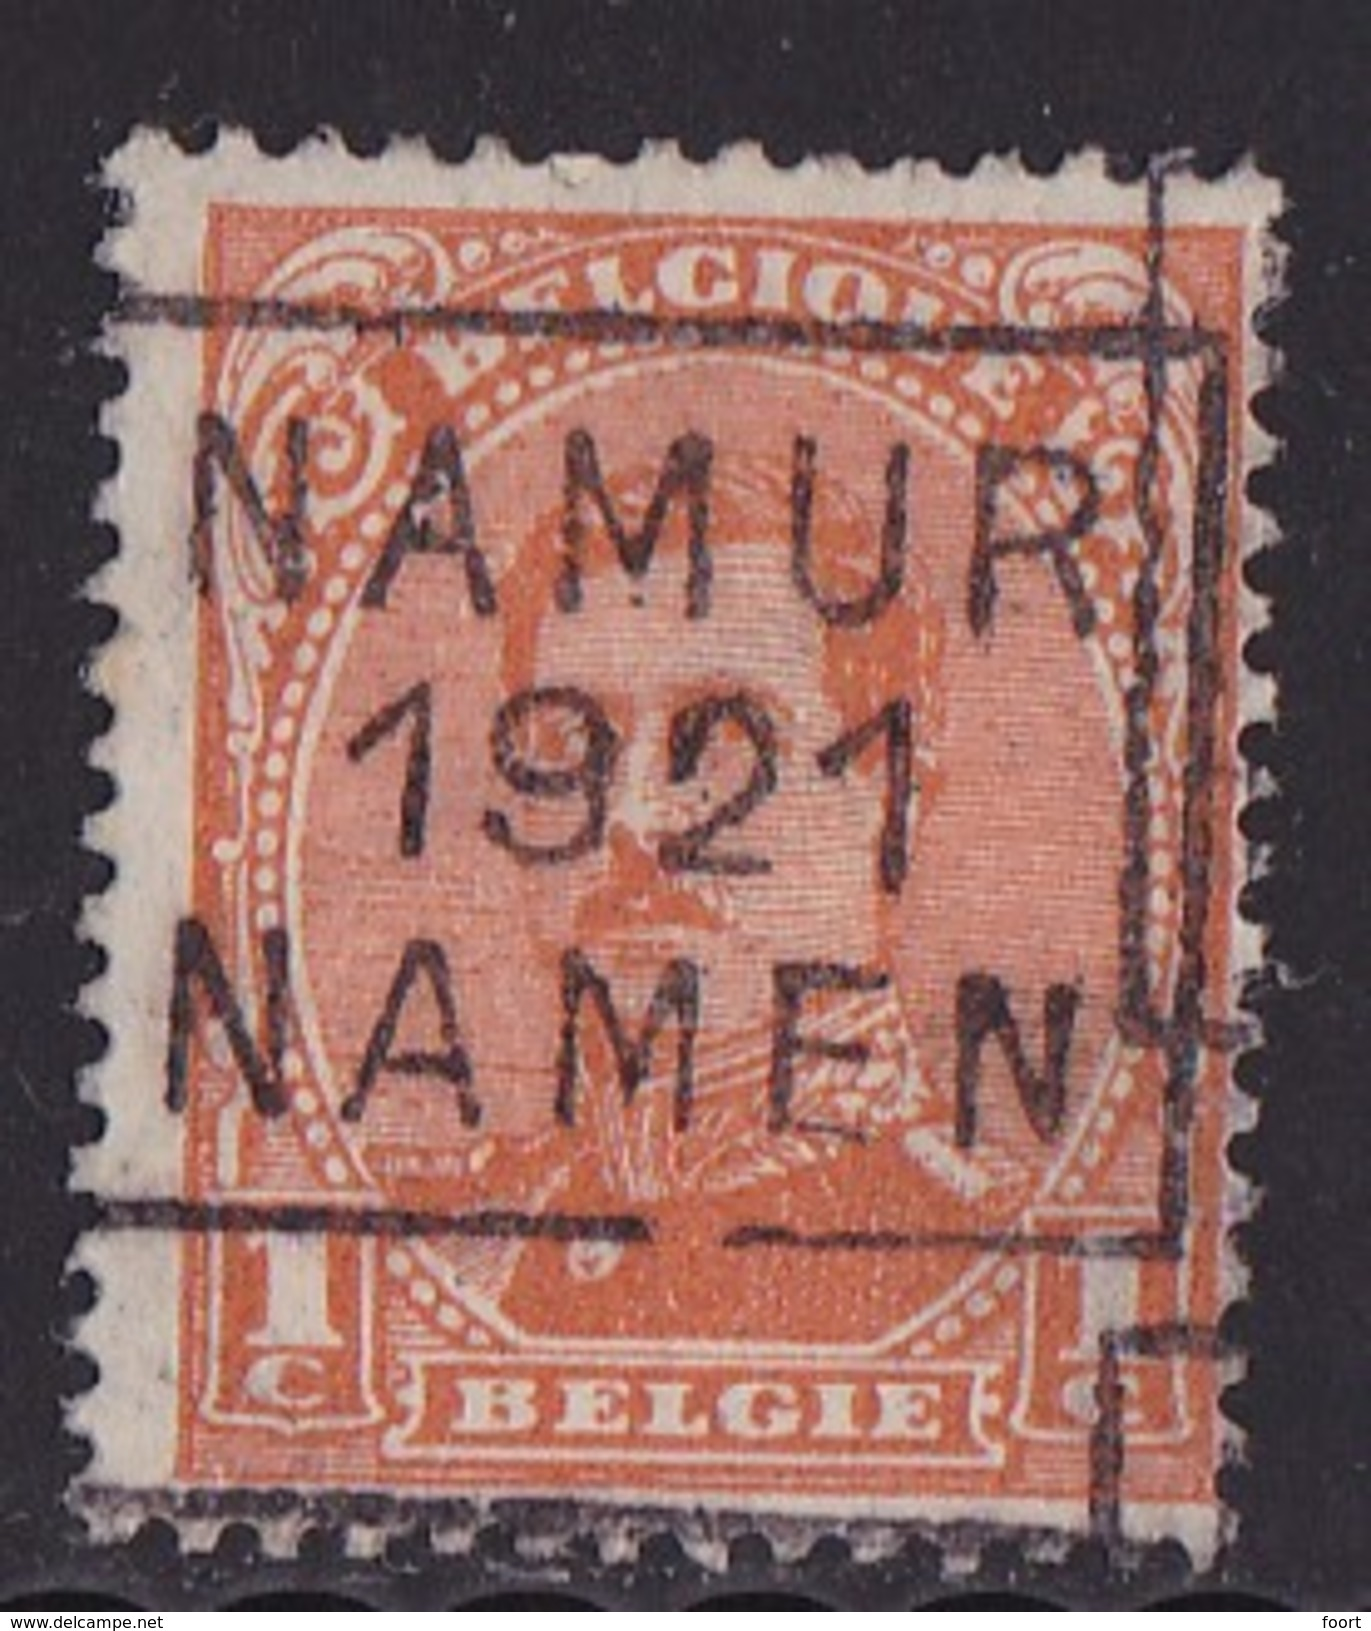 Namen 1921  Nr.  2649C - Preobliterati